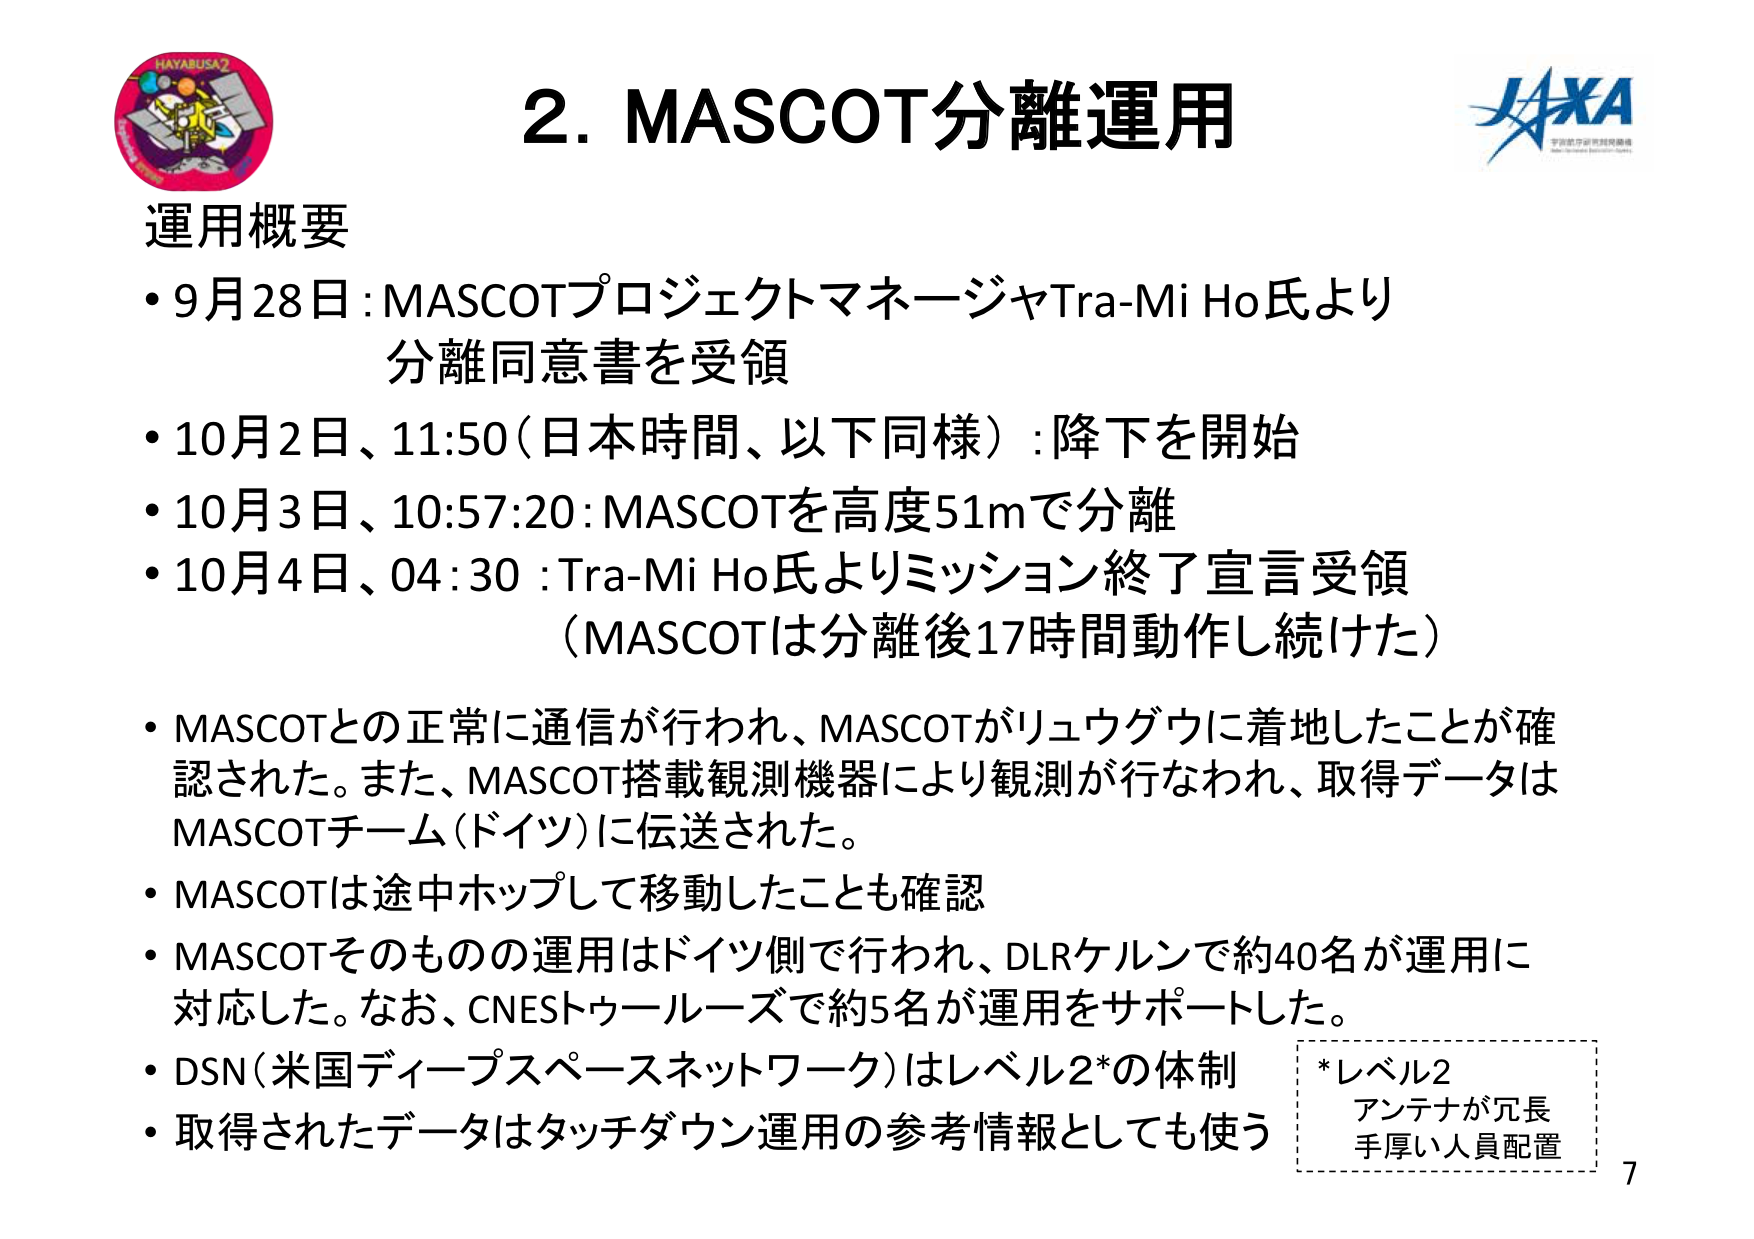 f:id:Imamura:20181011153946p:plain